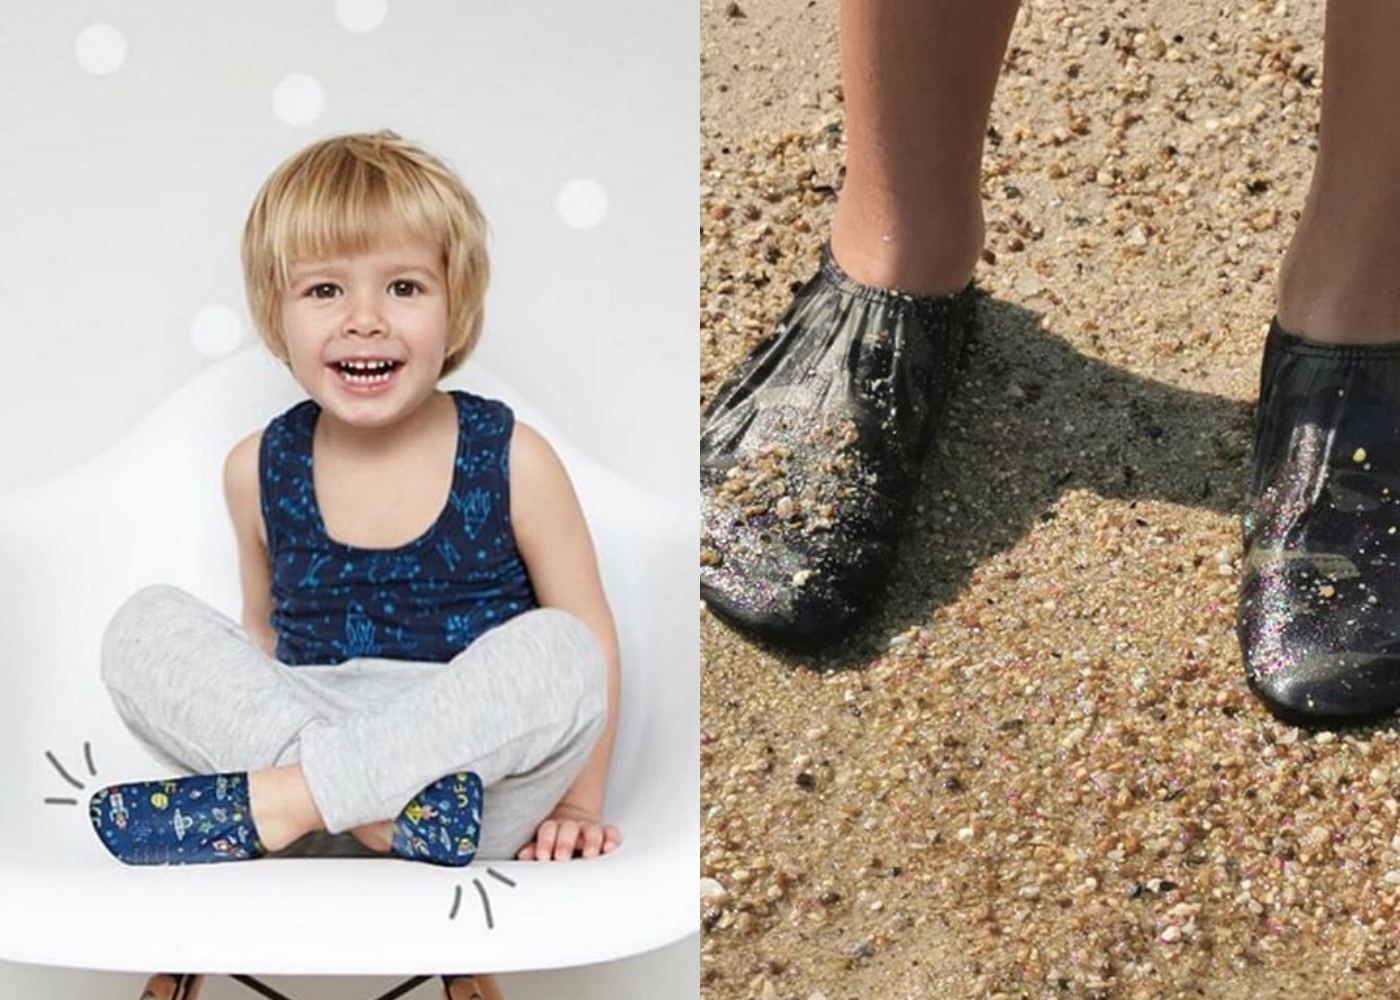 Slipstop waterschoen beschermt tegen heet zand